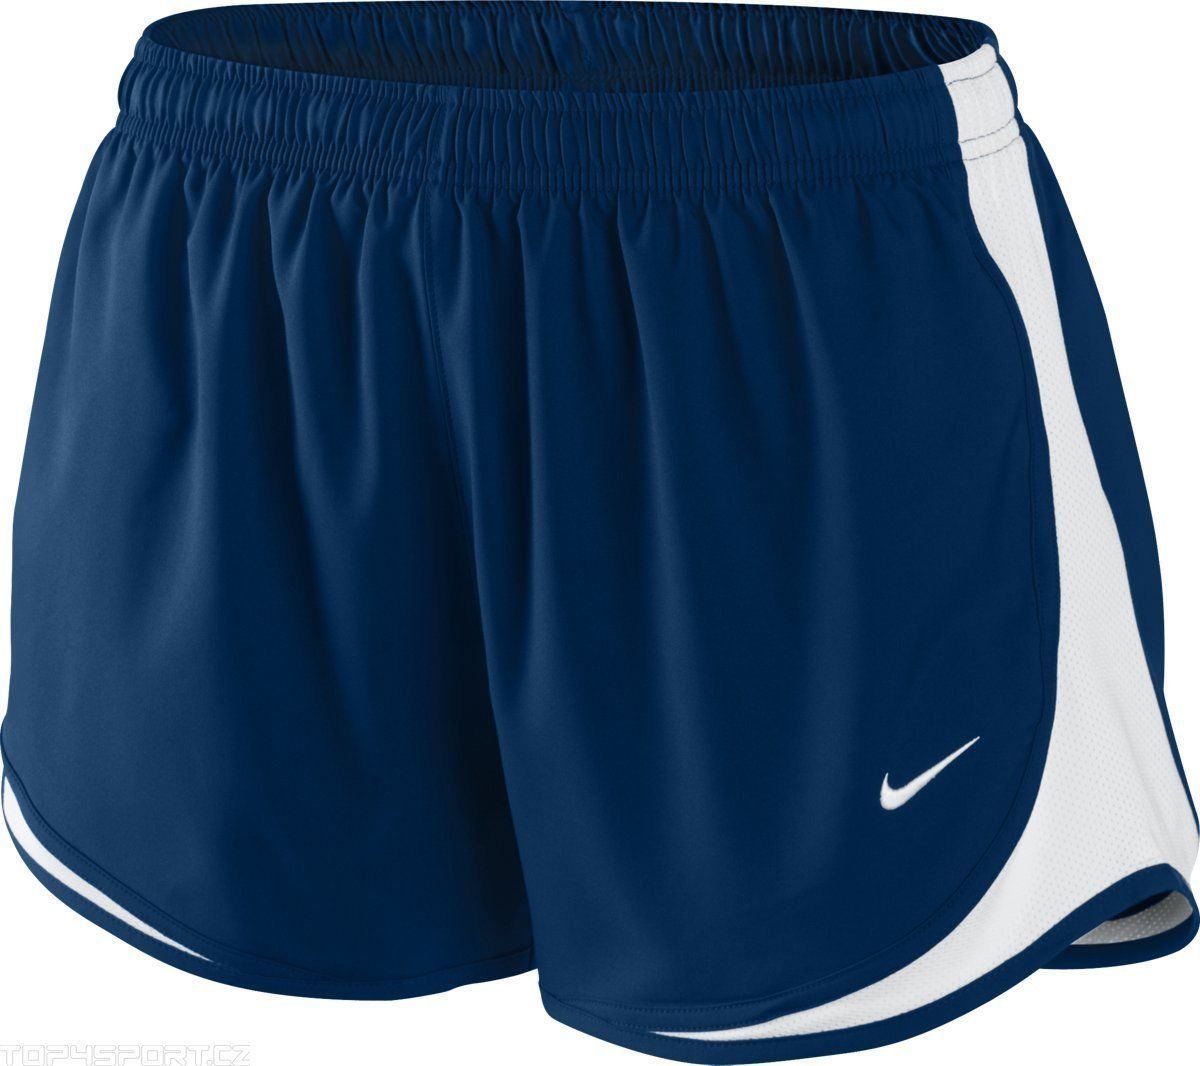 fe5bb1fd366a Nike Navy Blue Original Tempo Dri-Fit Women s 3